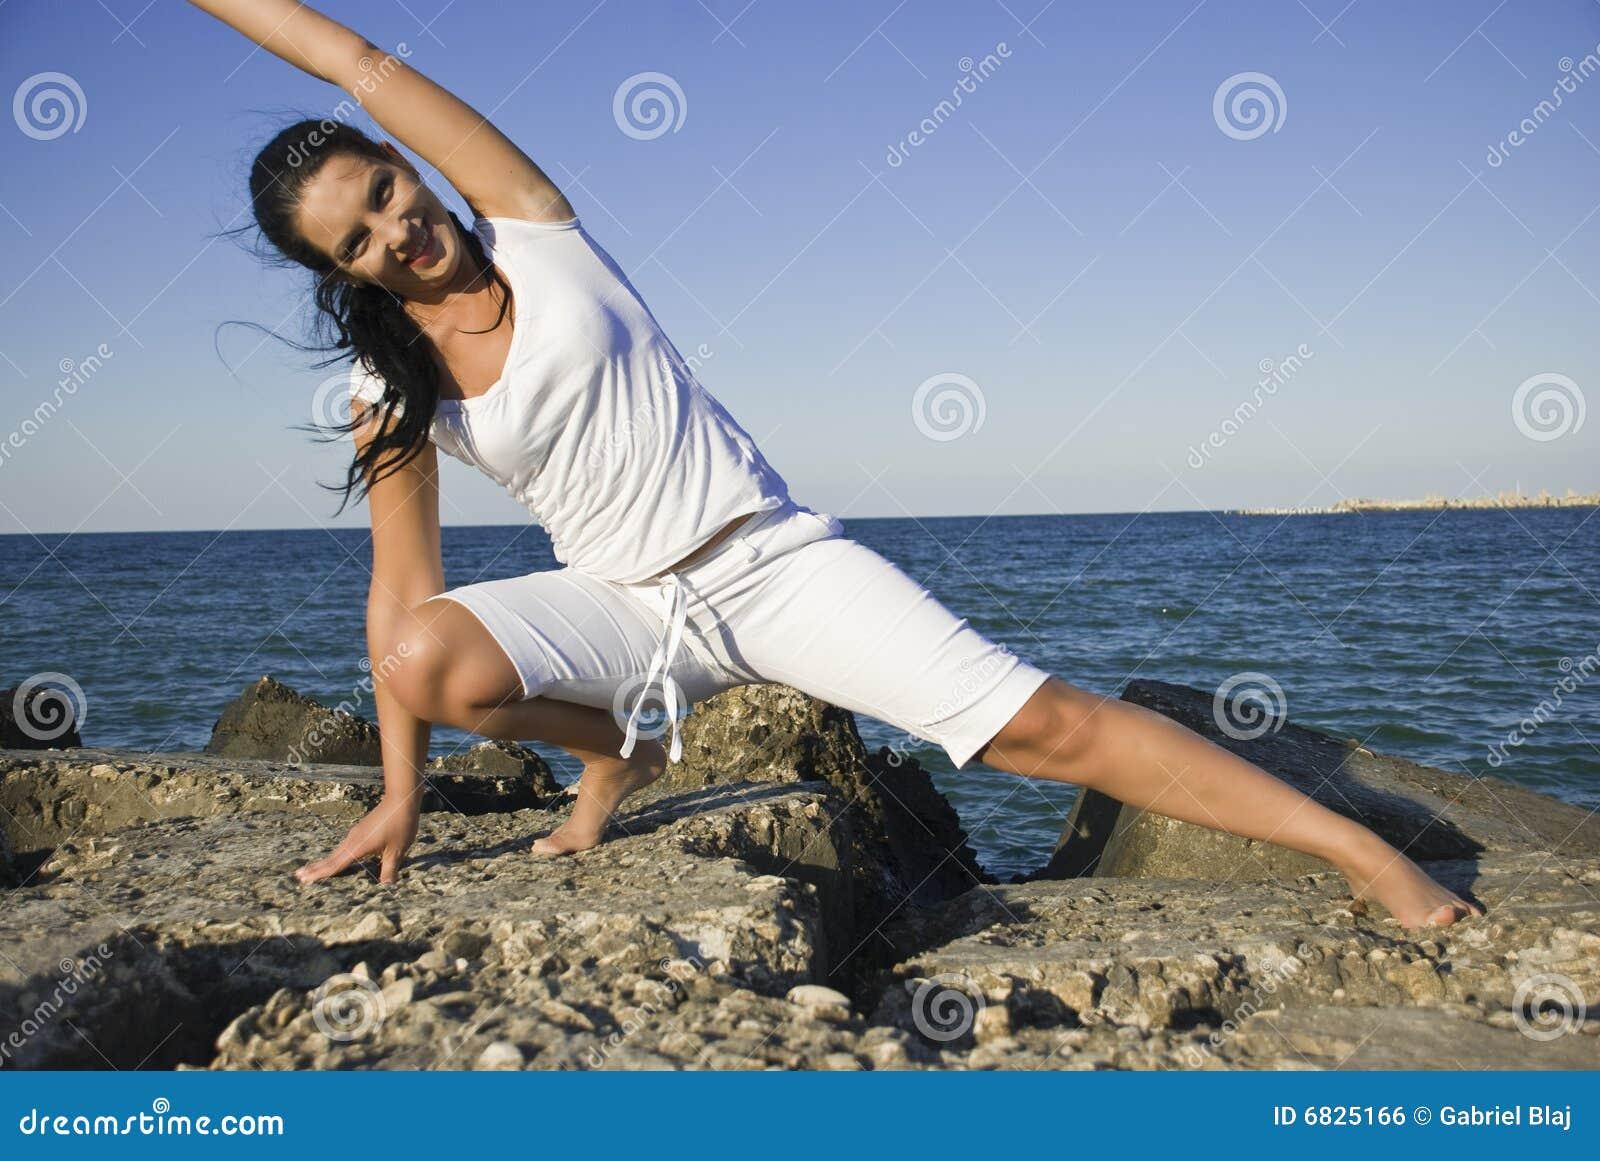 гимнастика трясет море